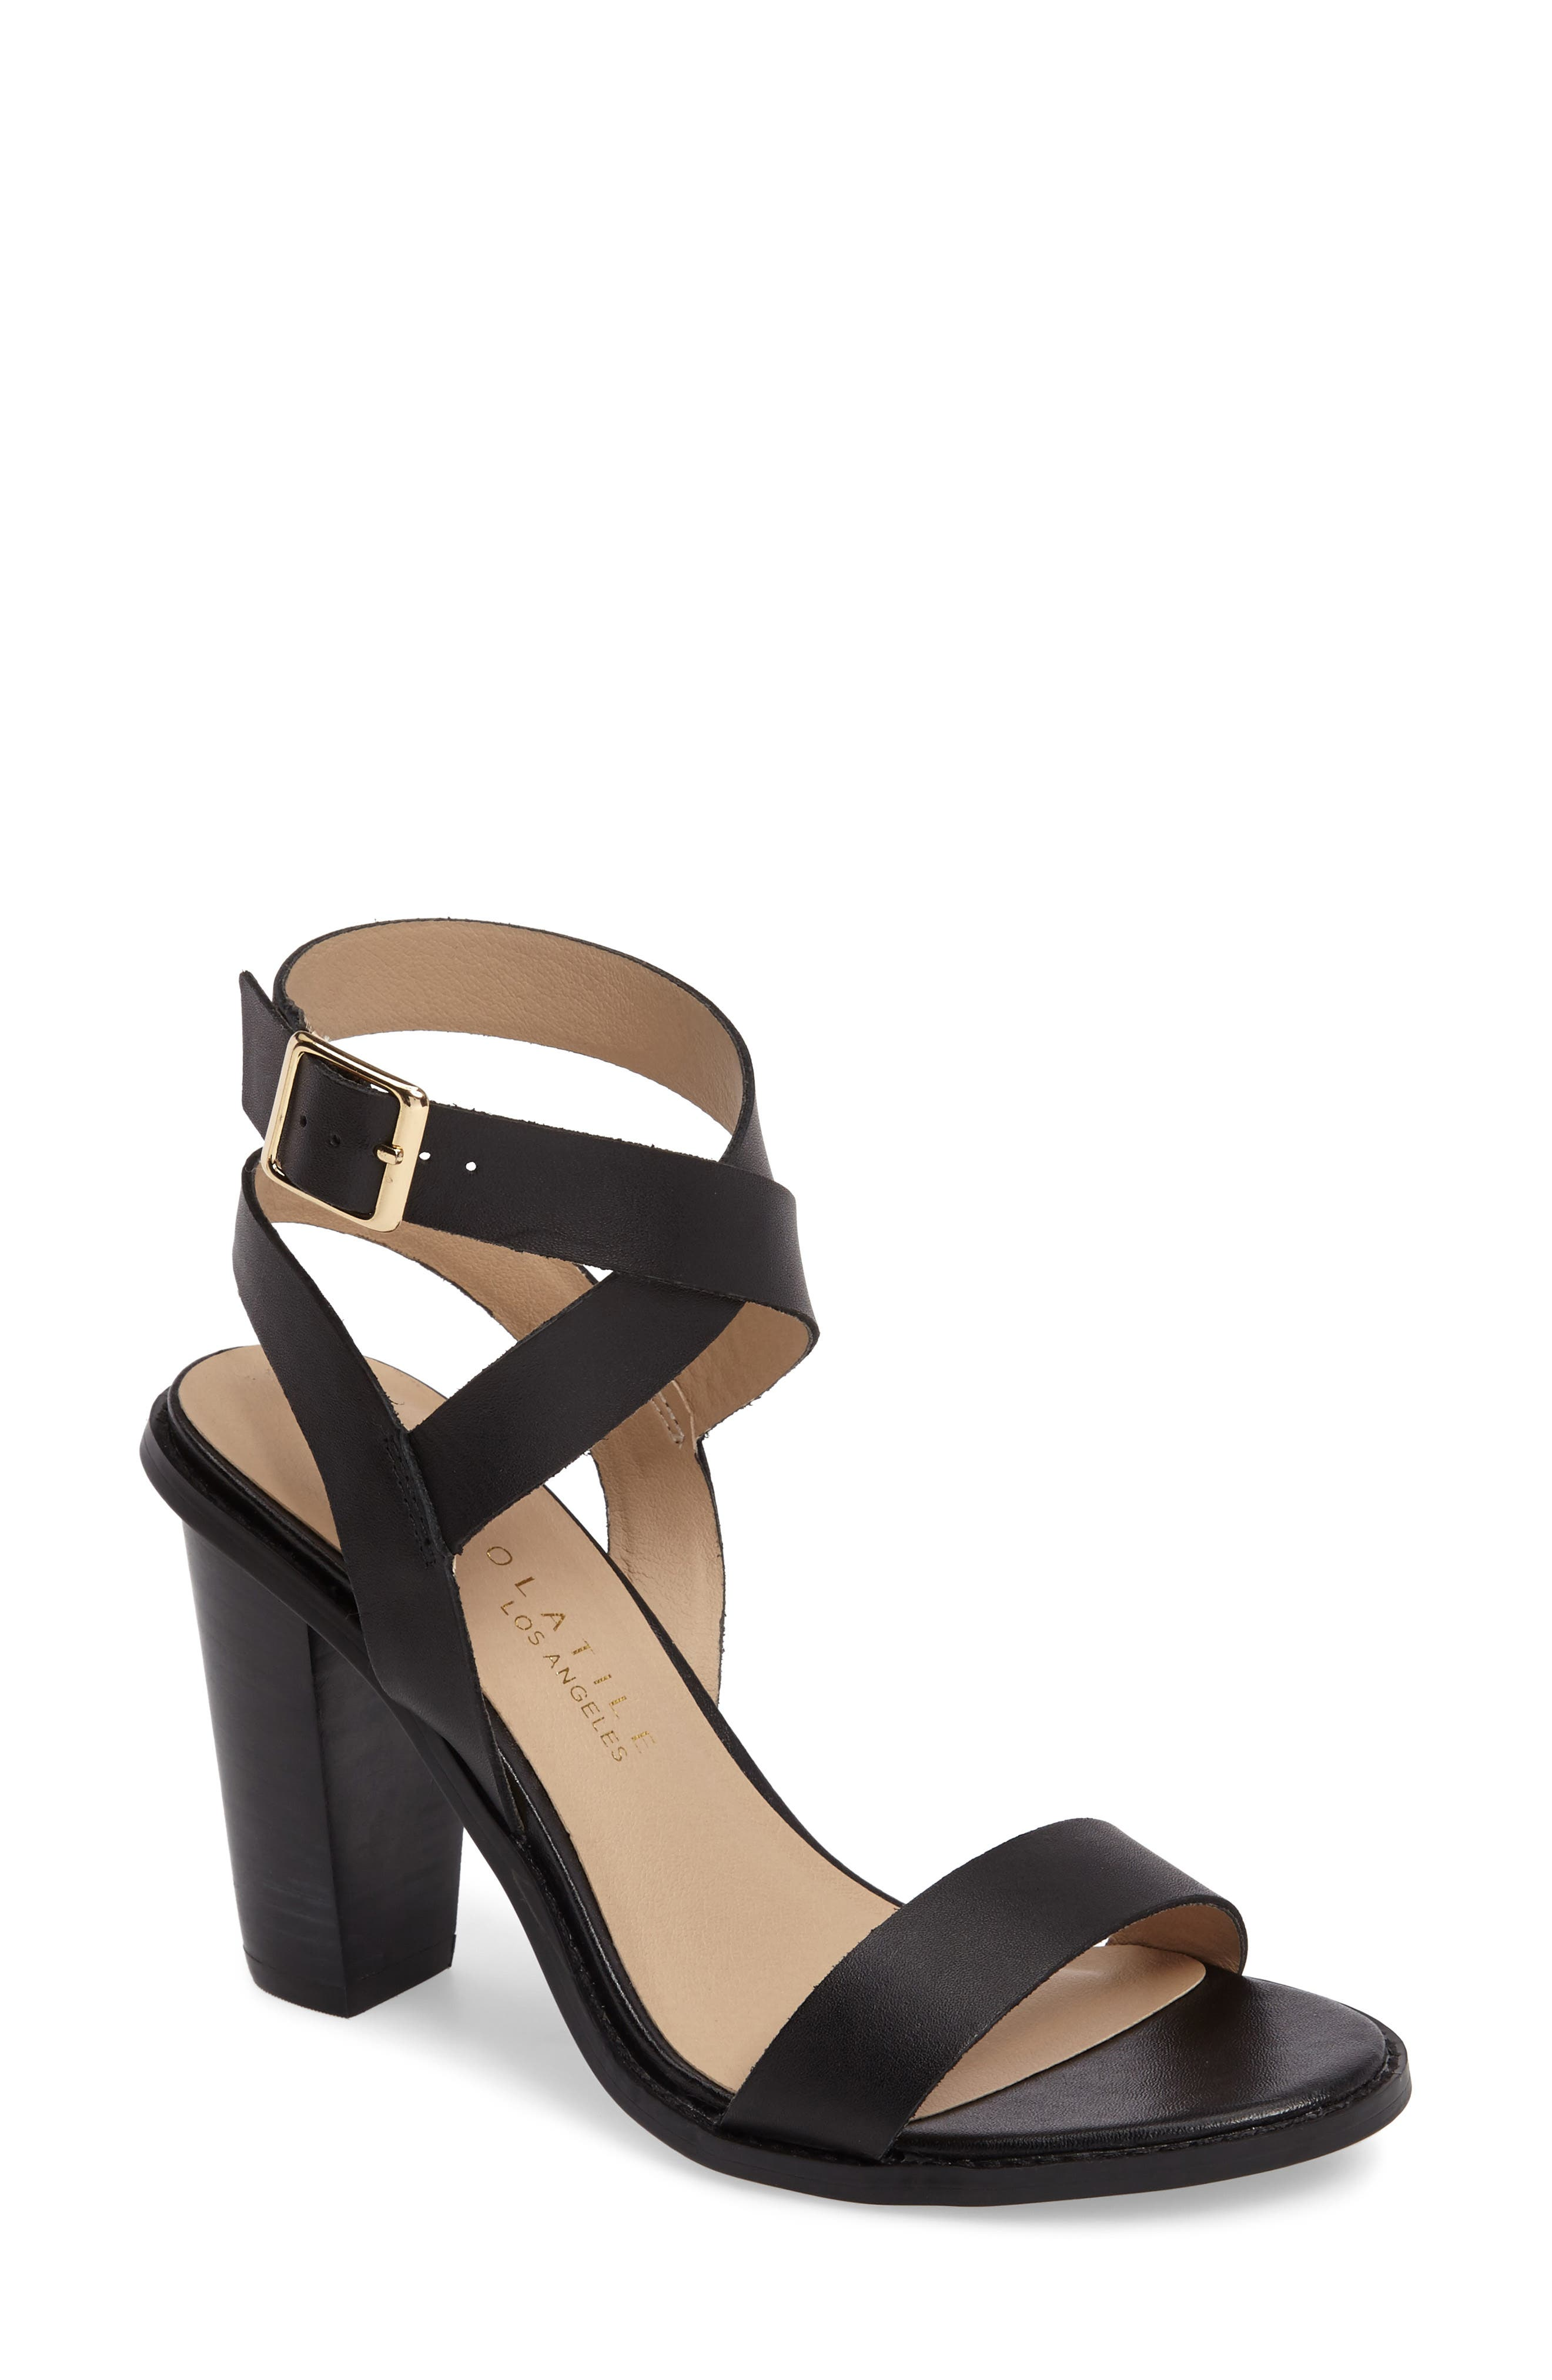 Poshy Ankle Wrap Sandal,                         Main,                         color, BLACK LEATHER